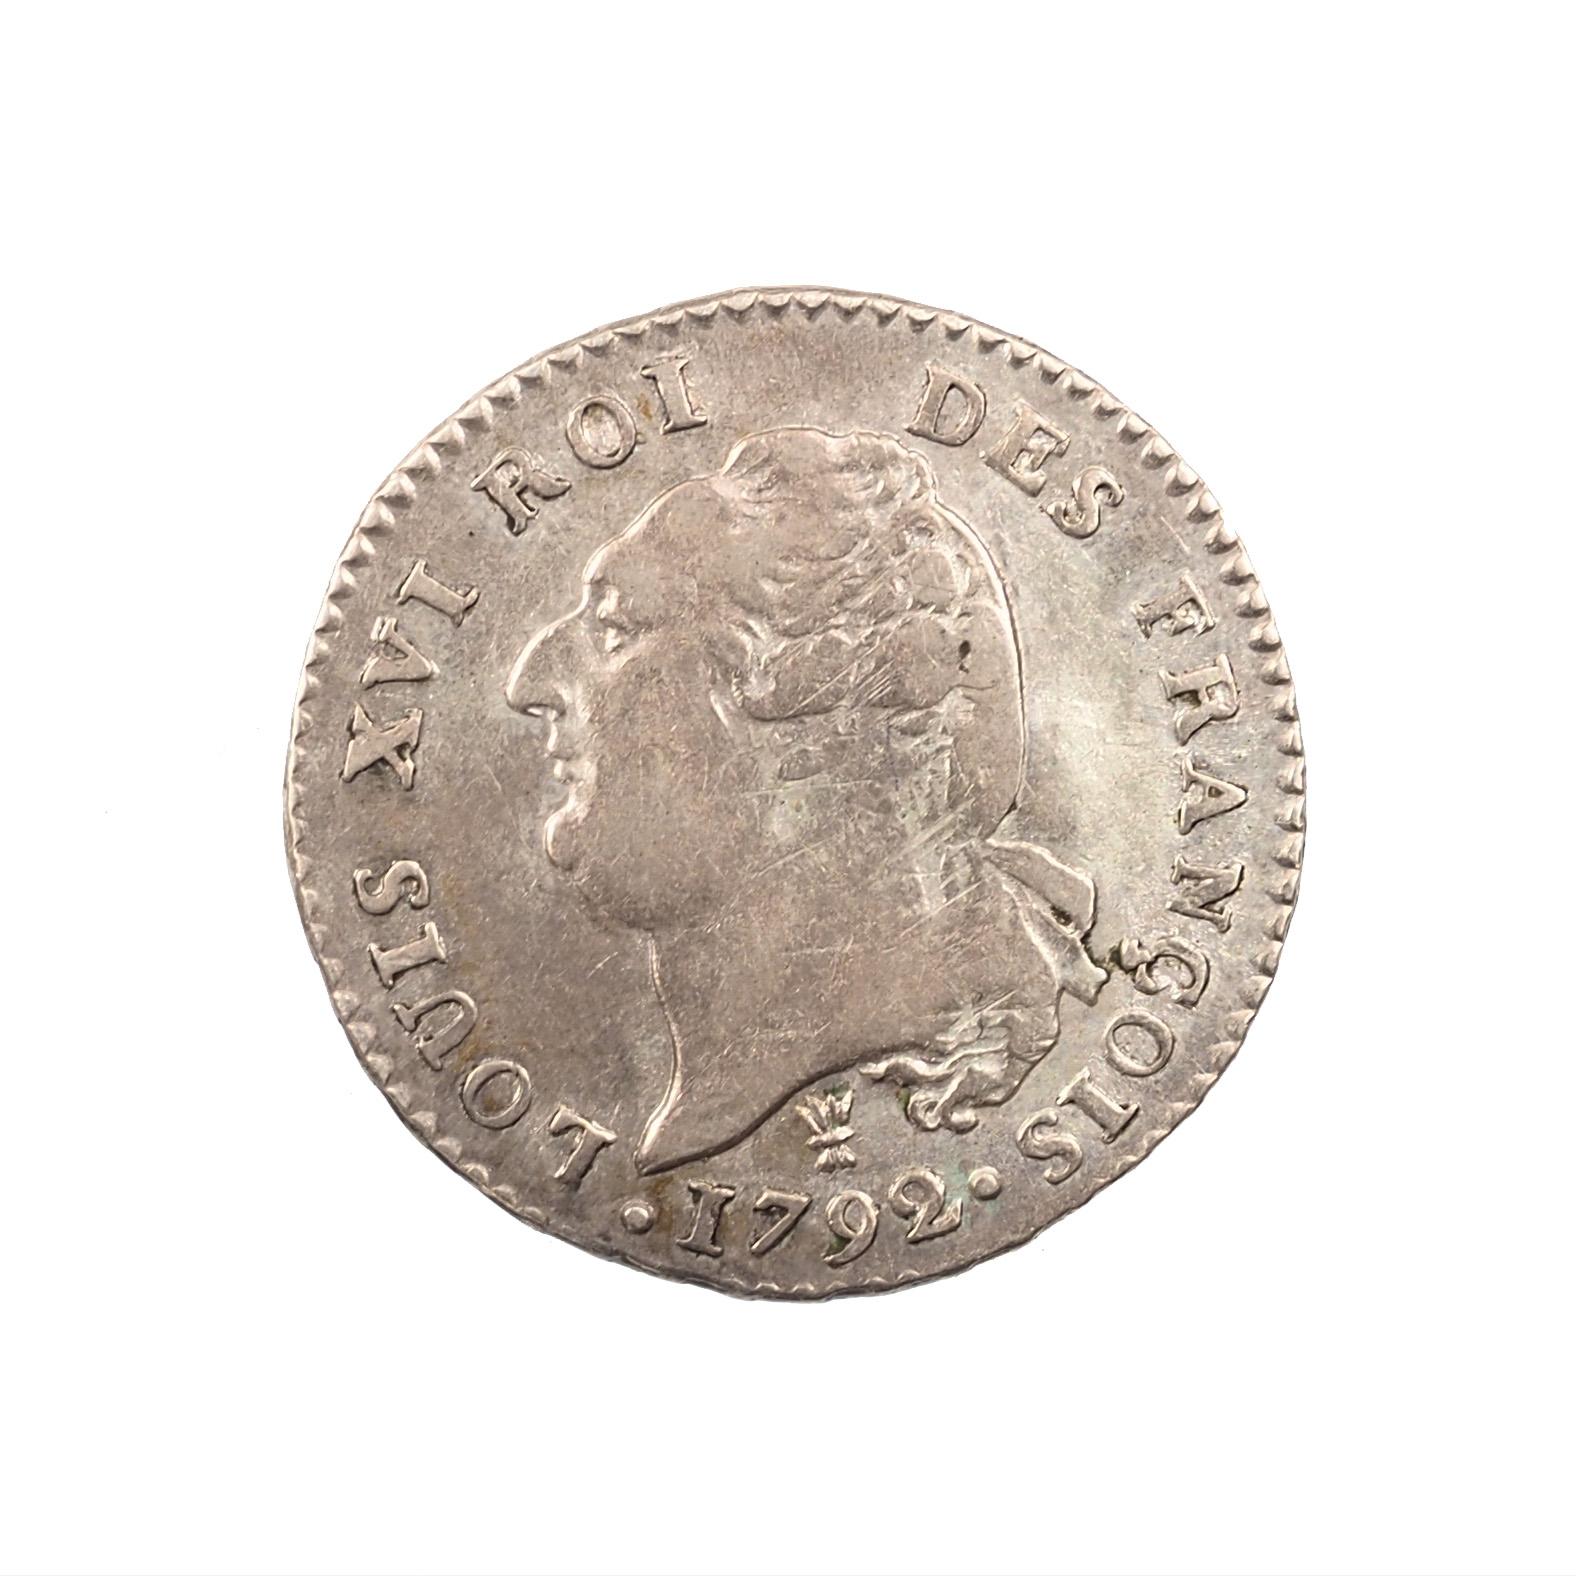 Louis XVI (1774-1792), 15 Sols 1792 I Limoges, Argent, TTB, Gad. 36